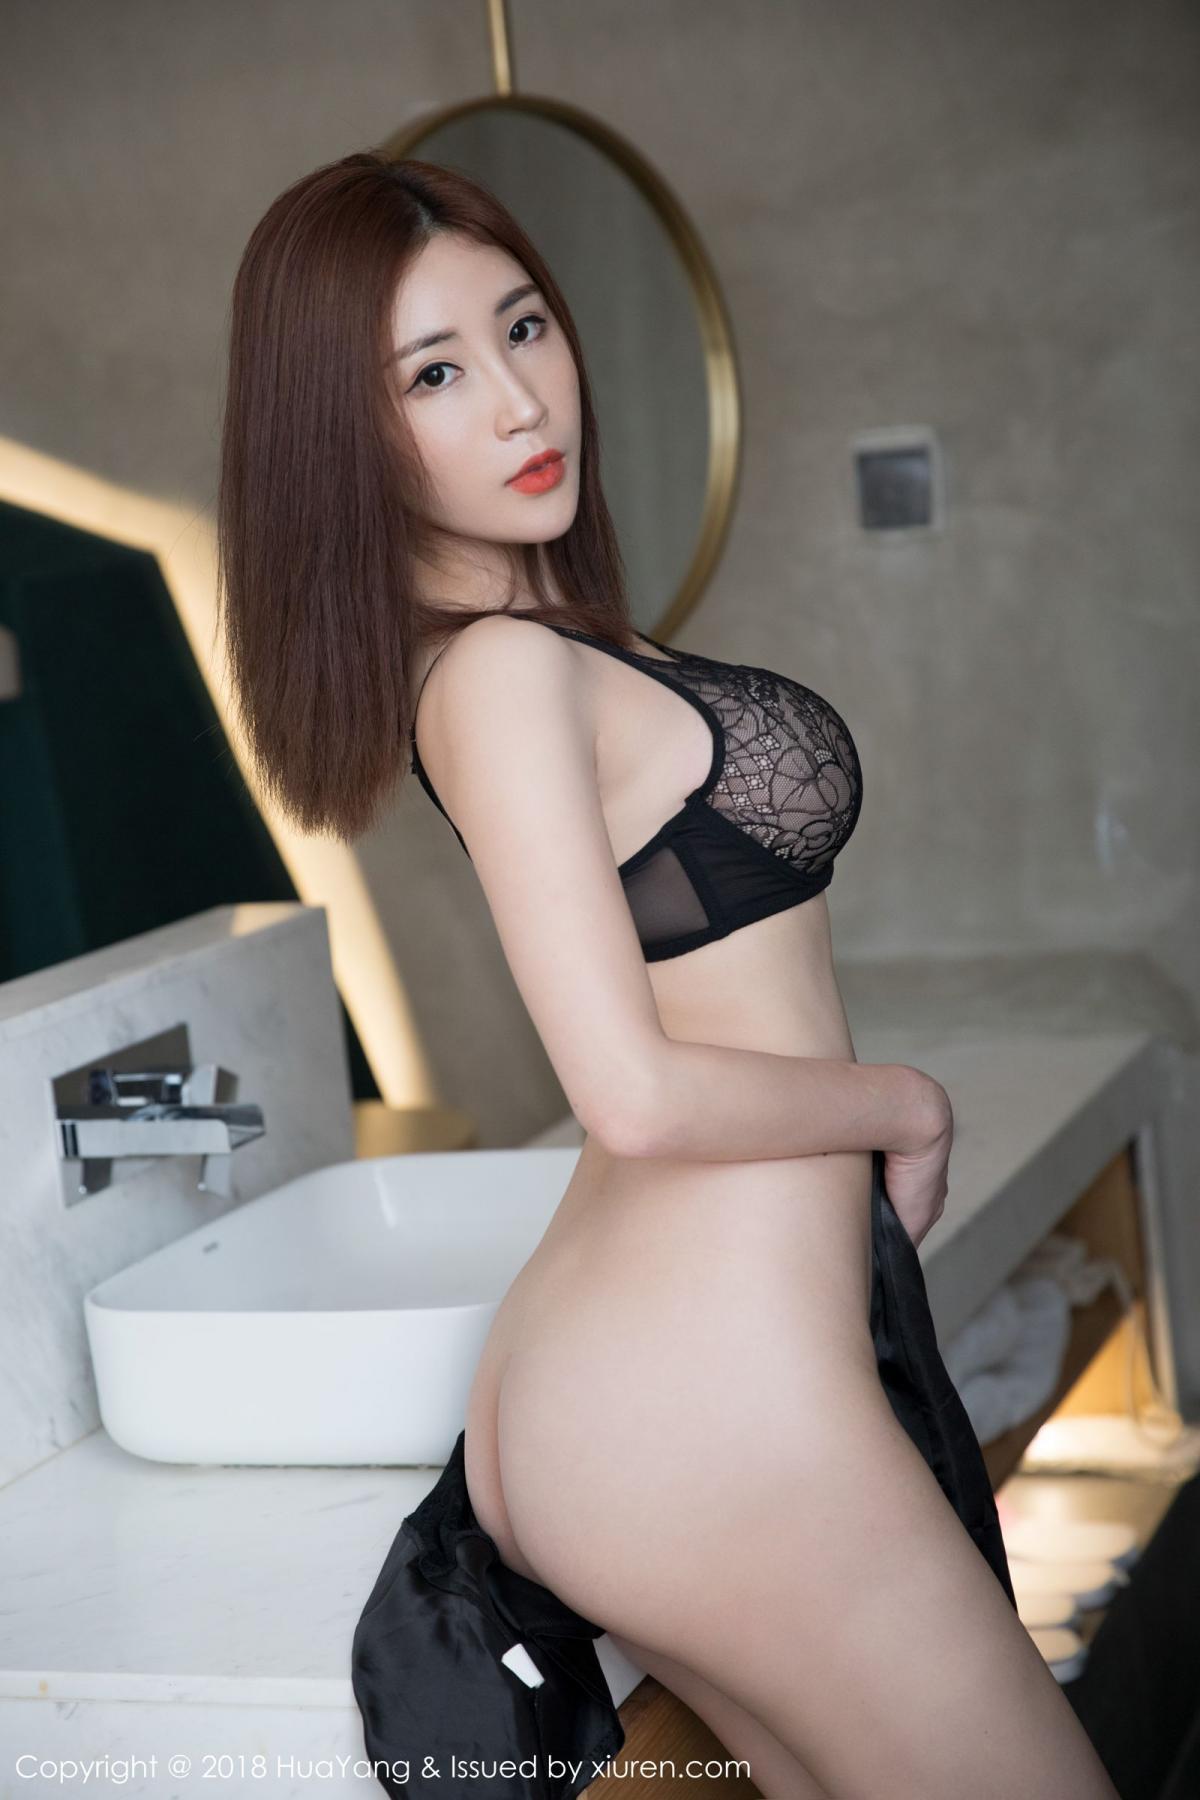 [Huayang] Vol.077 Sun Meng Yao 13P, Adult, Big Booty, HuaYang, Sun Meng Yao, Underwear